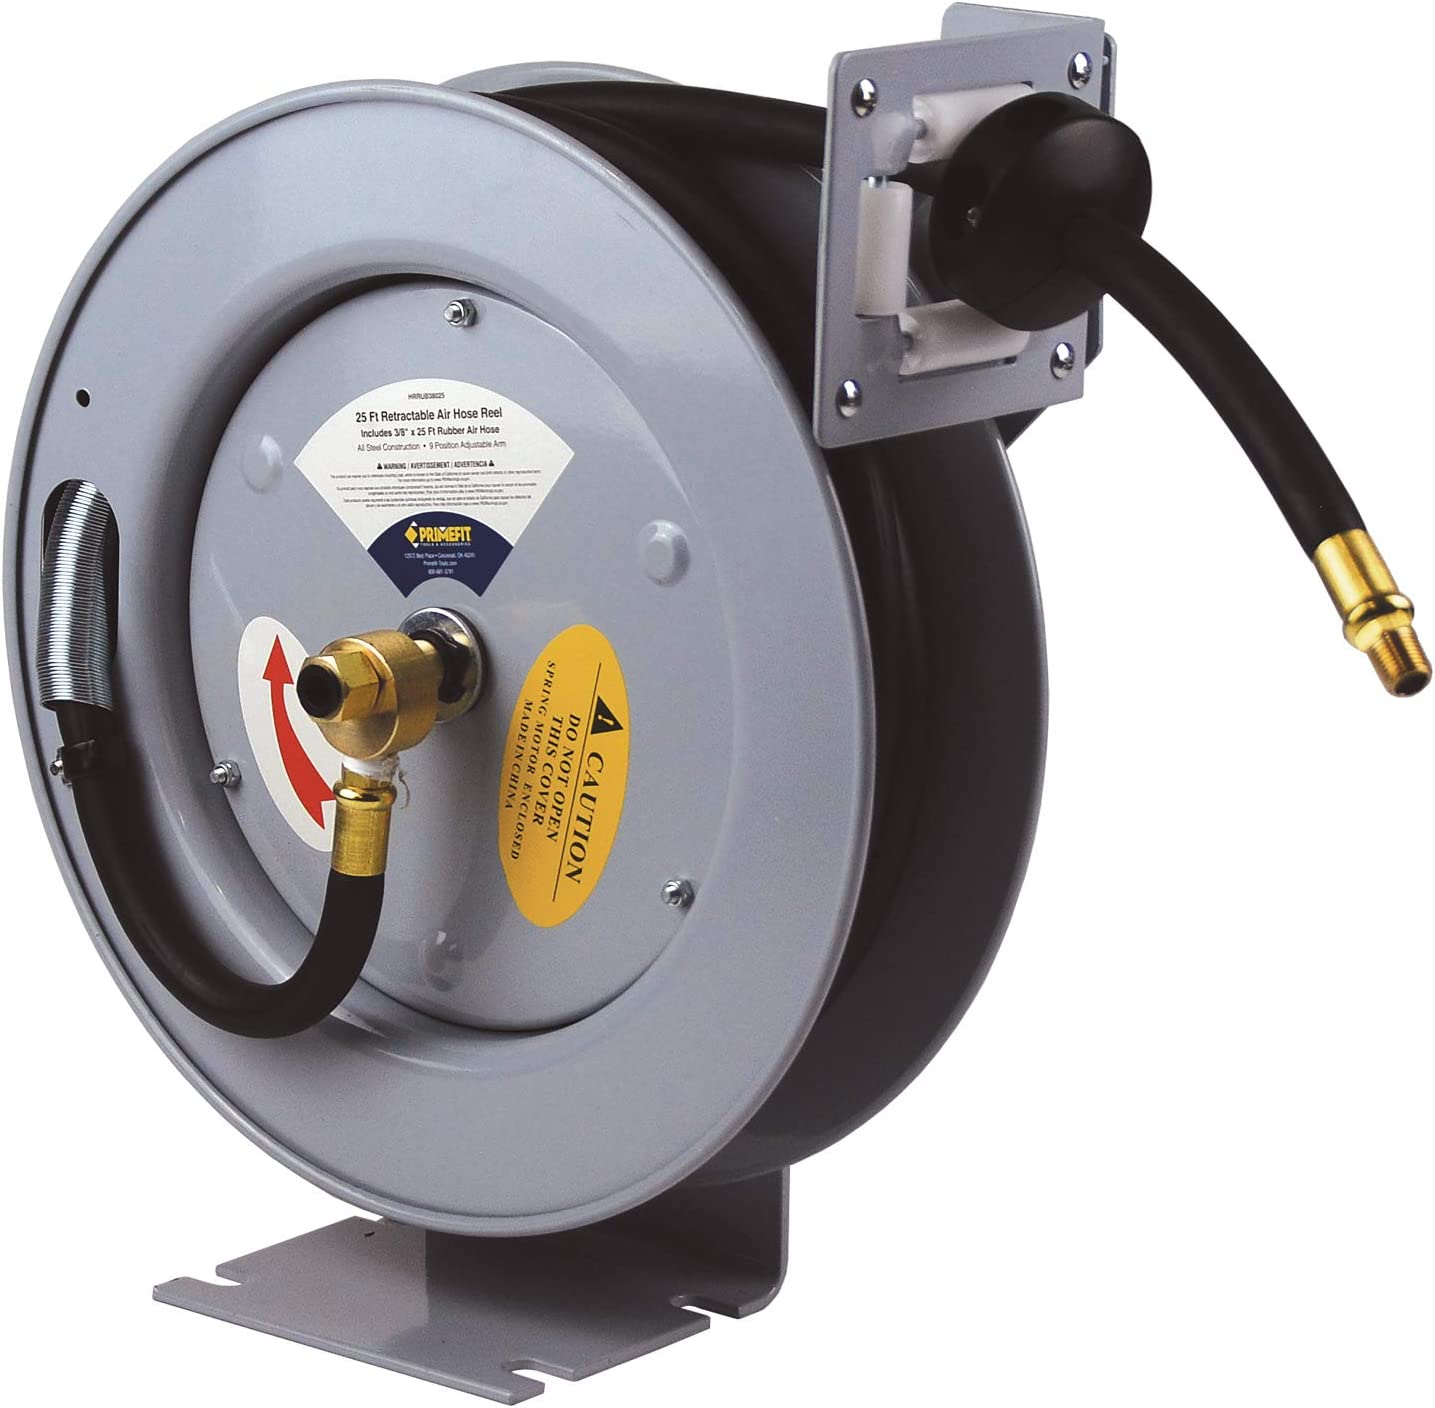 Primefit HRRUB380253 Industrial Grade Retractable Air Hose Reel with 25-Foot Rubber Air Hose, Medium